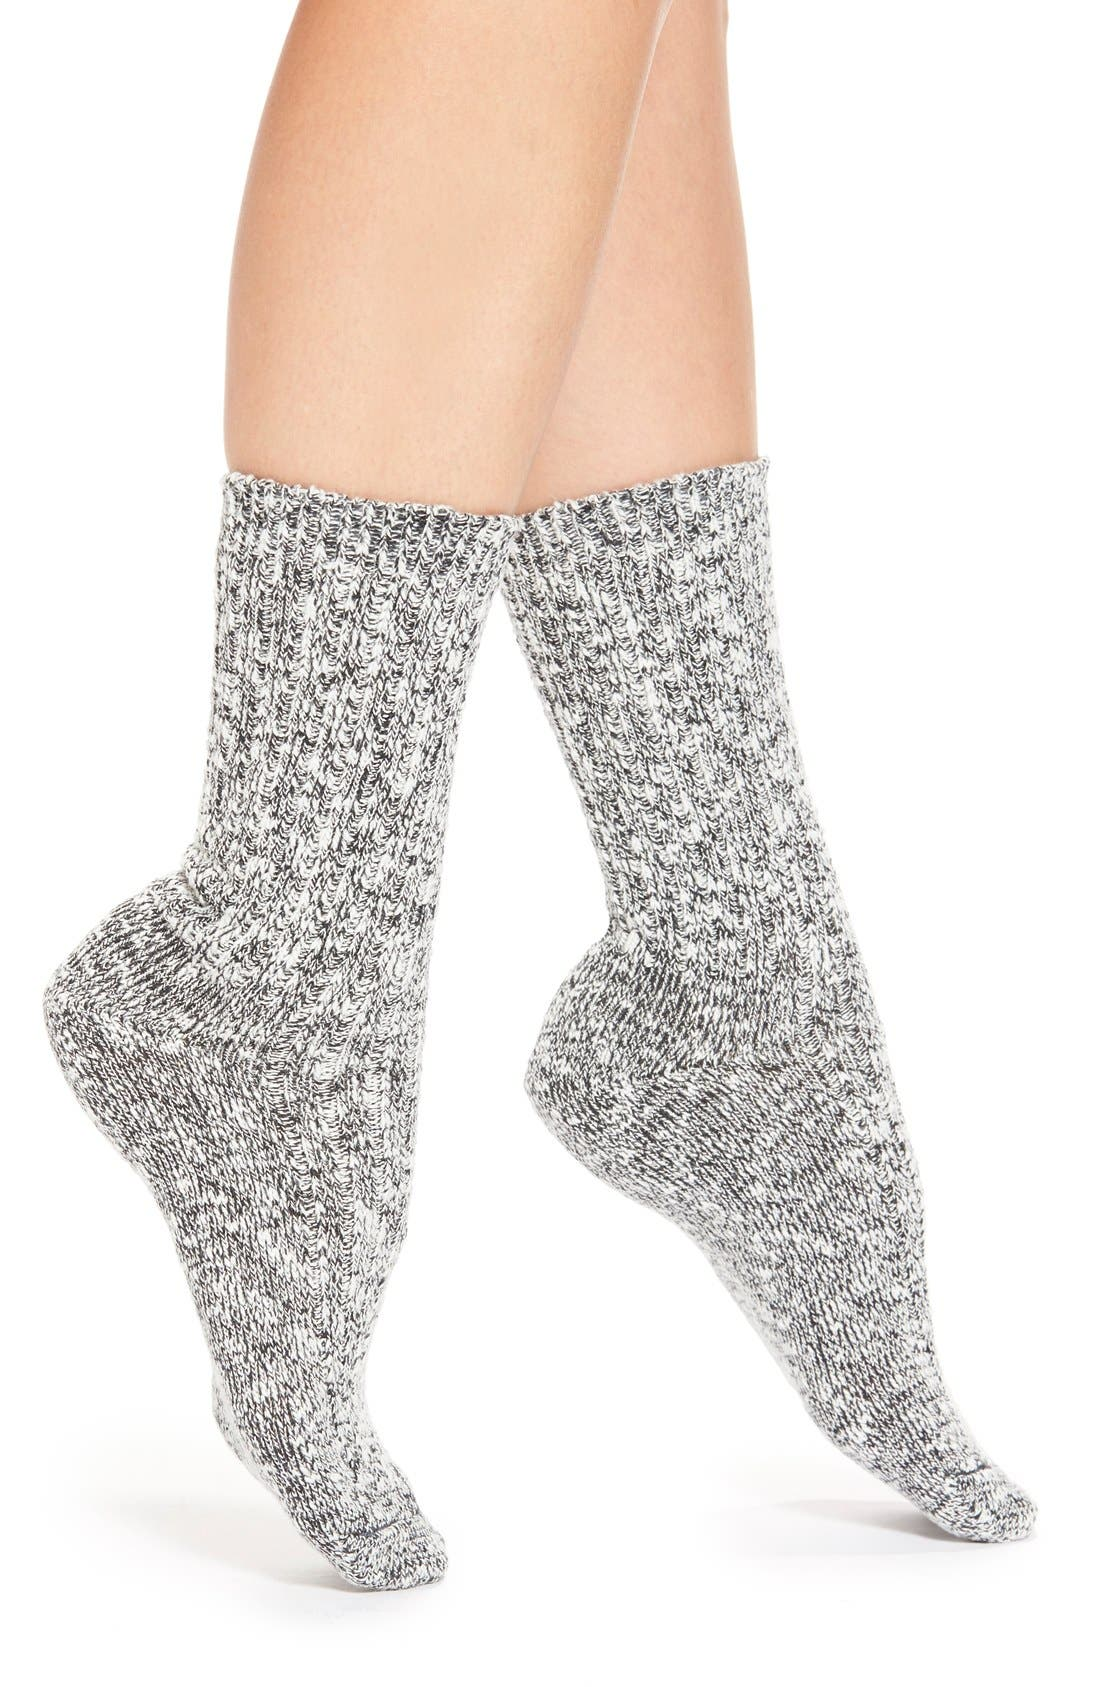 Alternate Image 1 Selected - Wigwam 'Cypress' Crew Socks